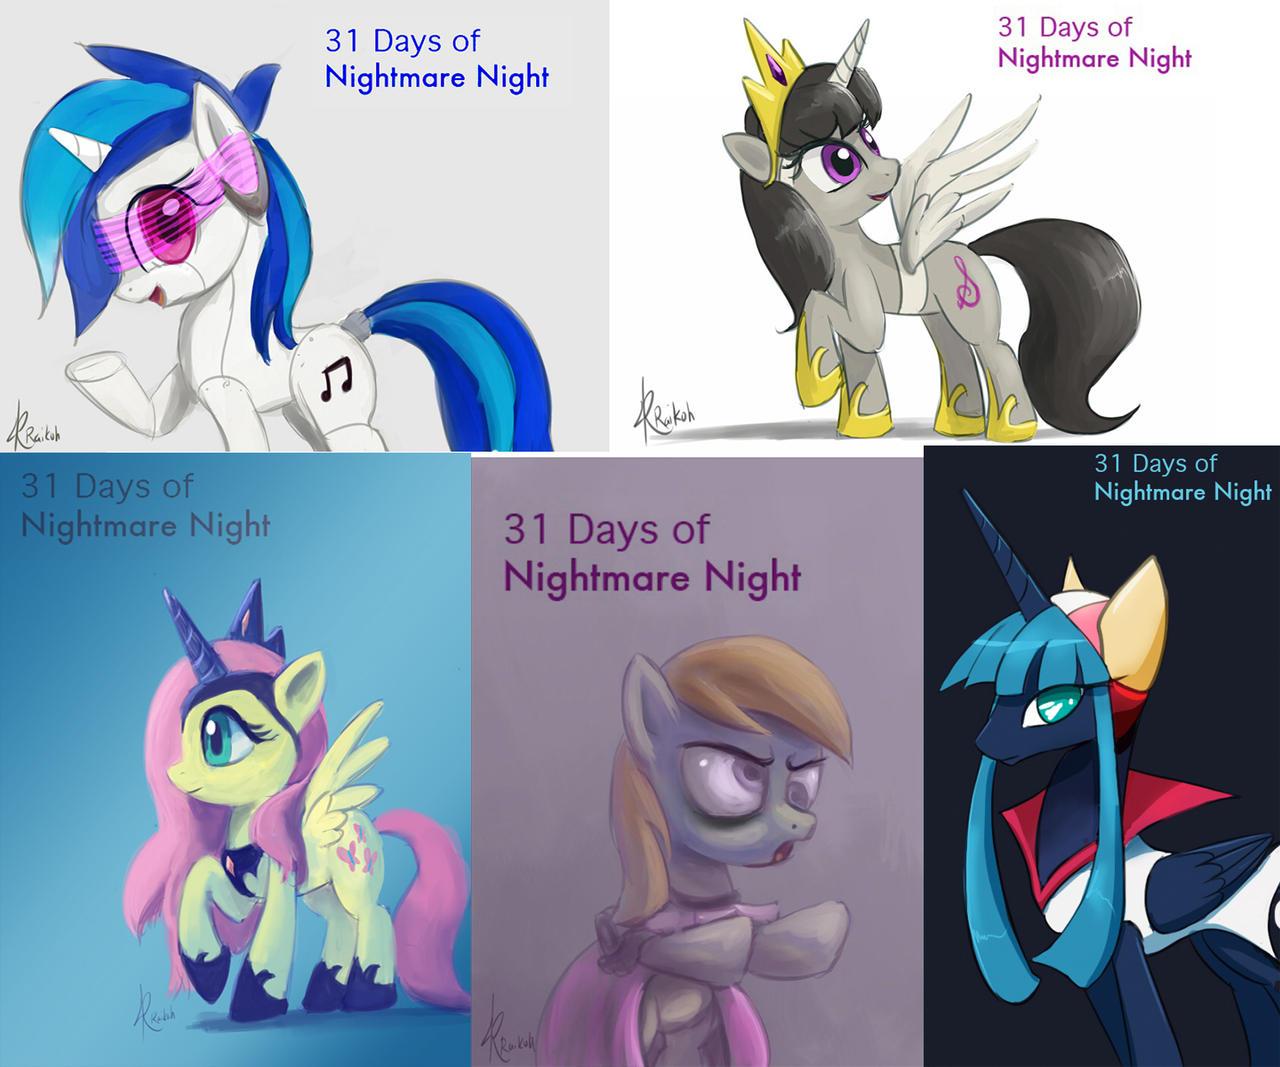 31 days of Nightmare Night set #2 by Raikoh-illust